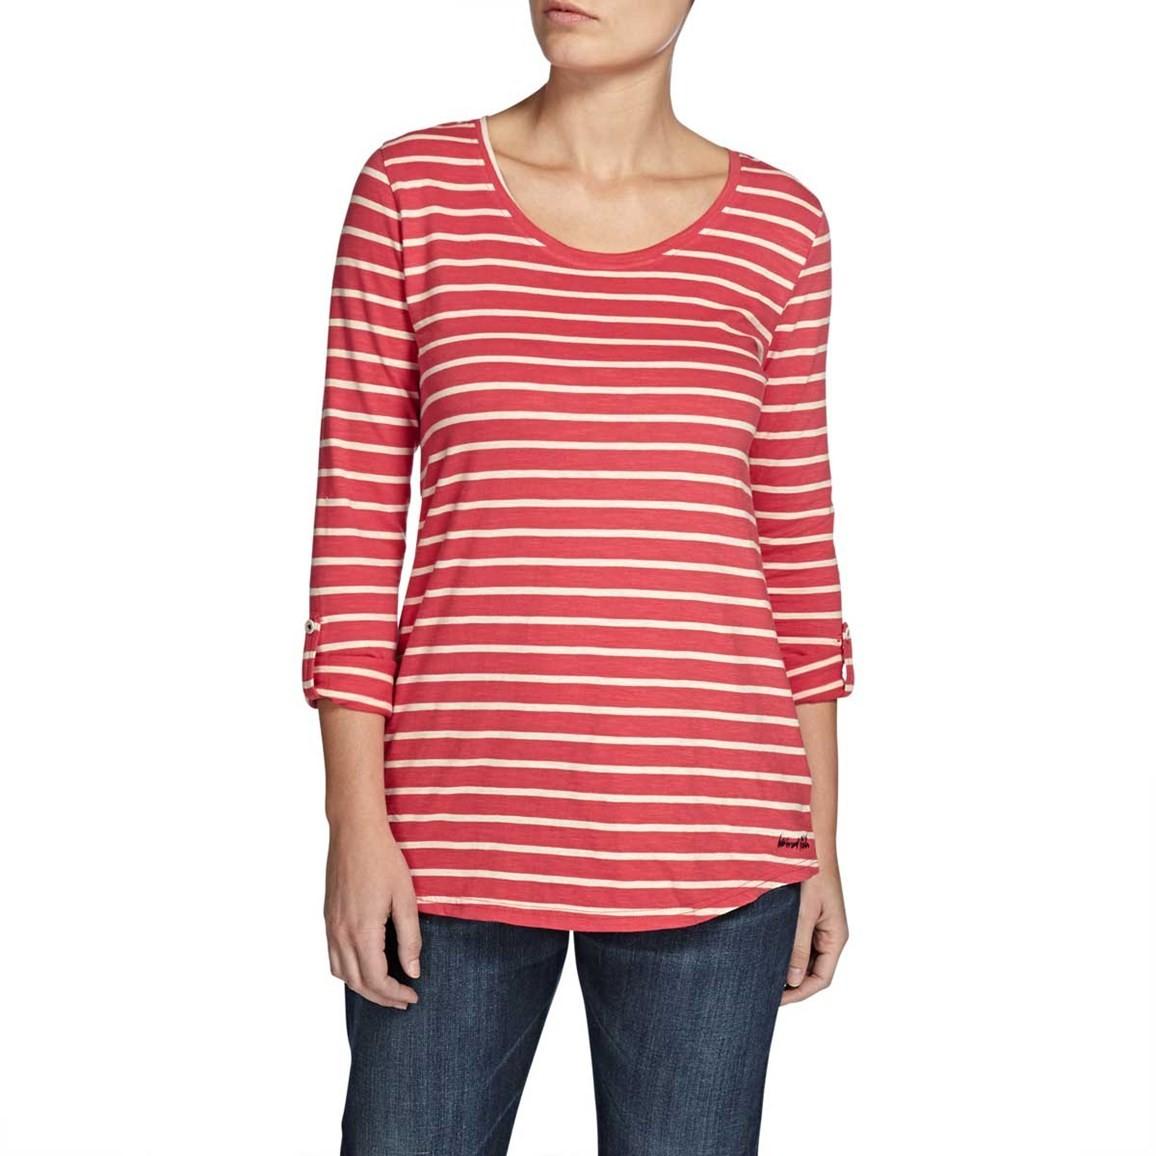 Fairfax Striped Long Sleeve Slub T-Shirt Foxberry